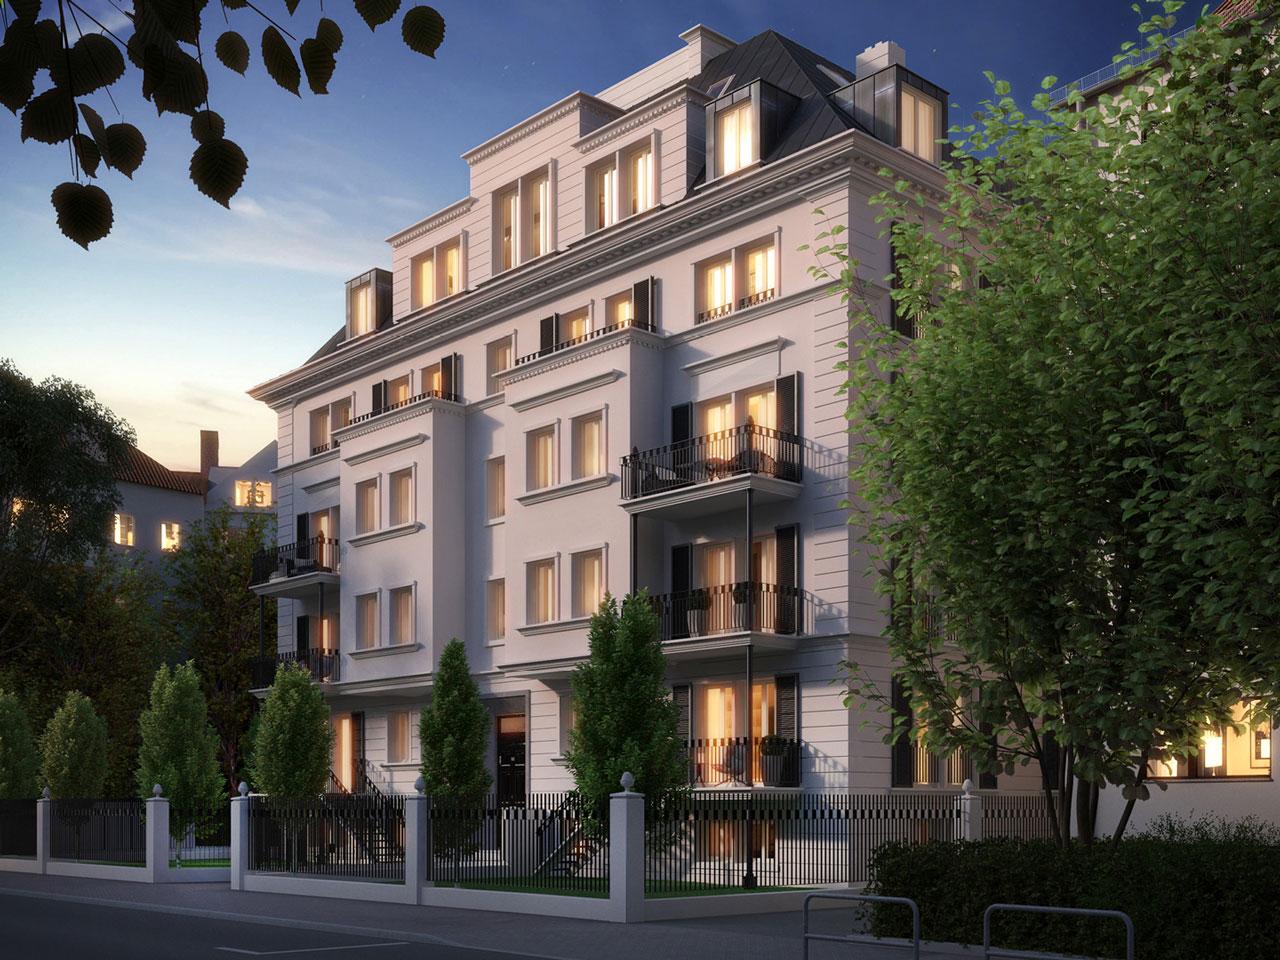 immobilien hochbau in frankfurt am main infobel deutschland. Black Bedroom Furniture Sets. Home Design Ideas